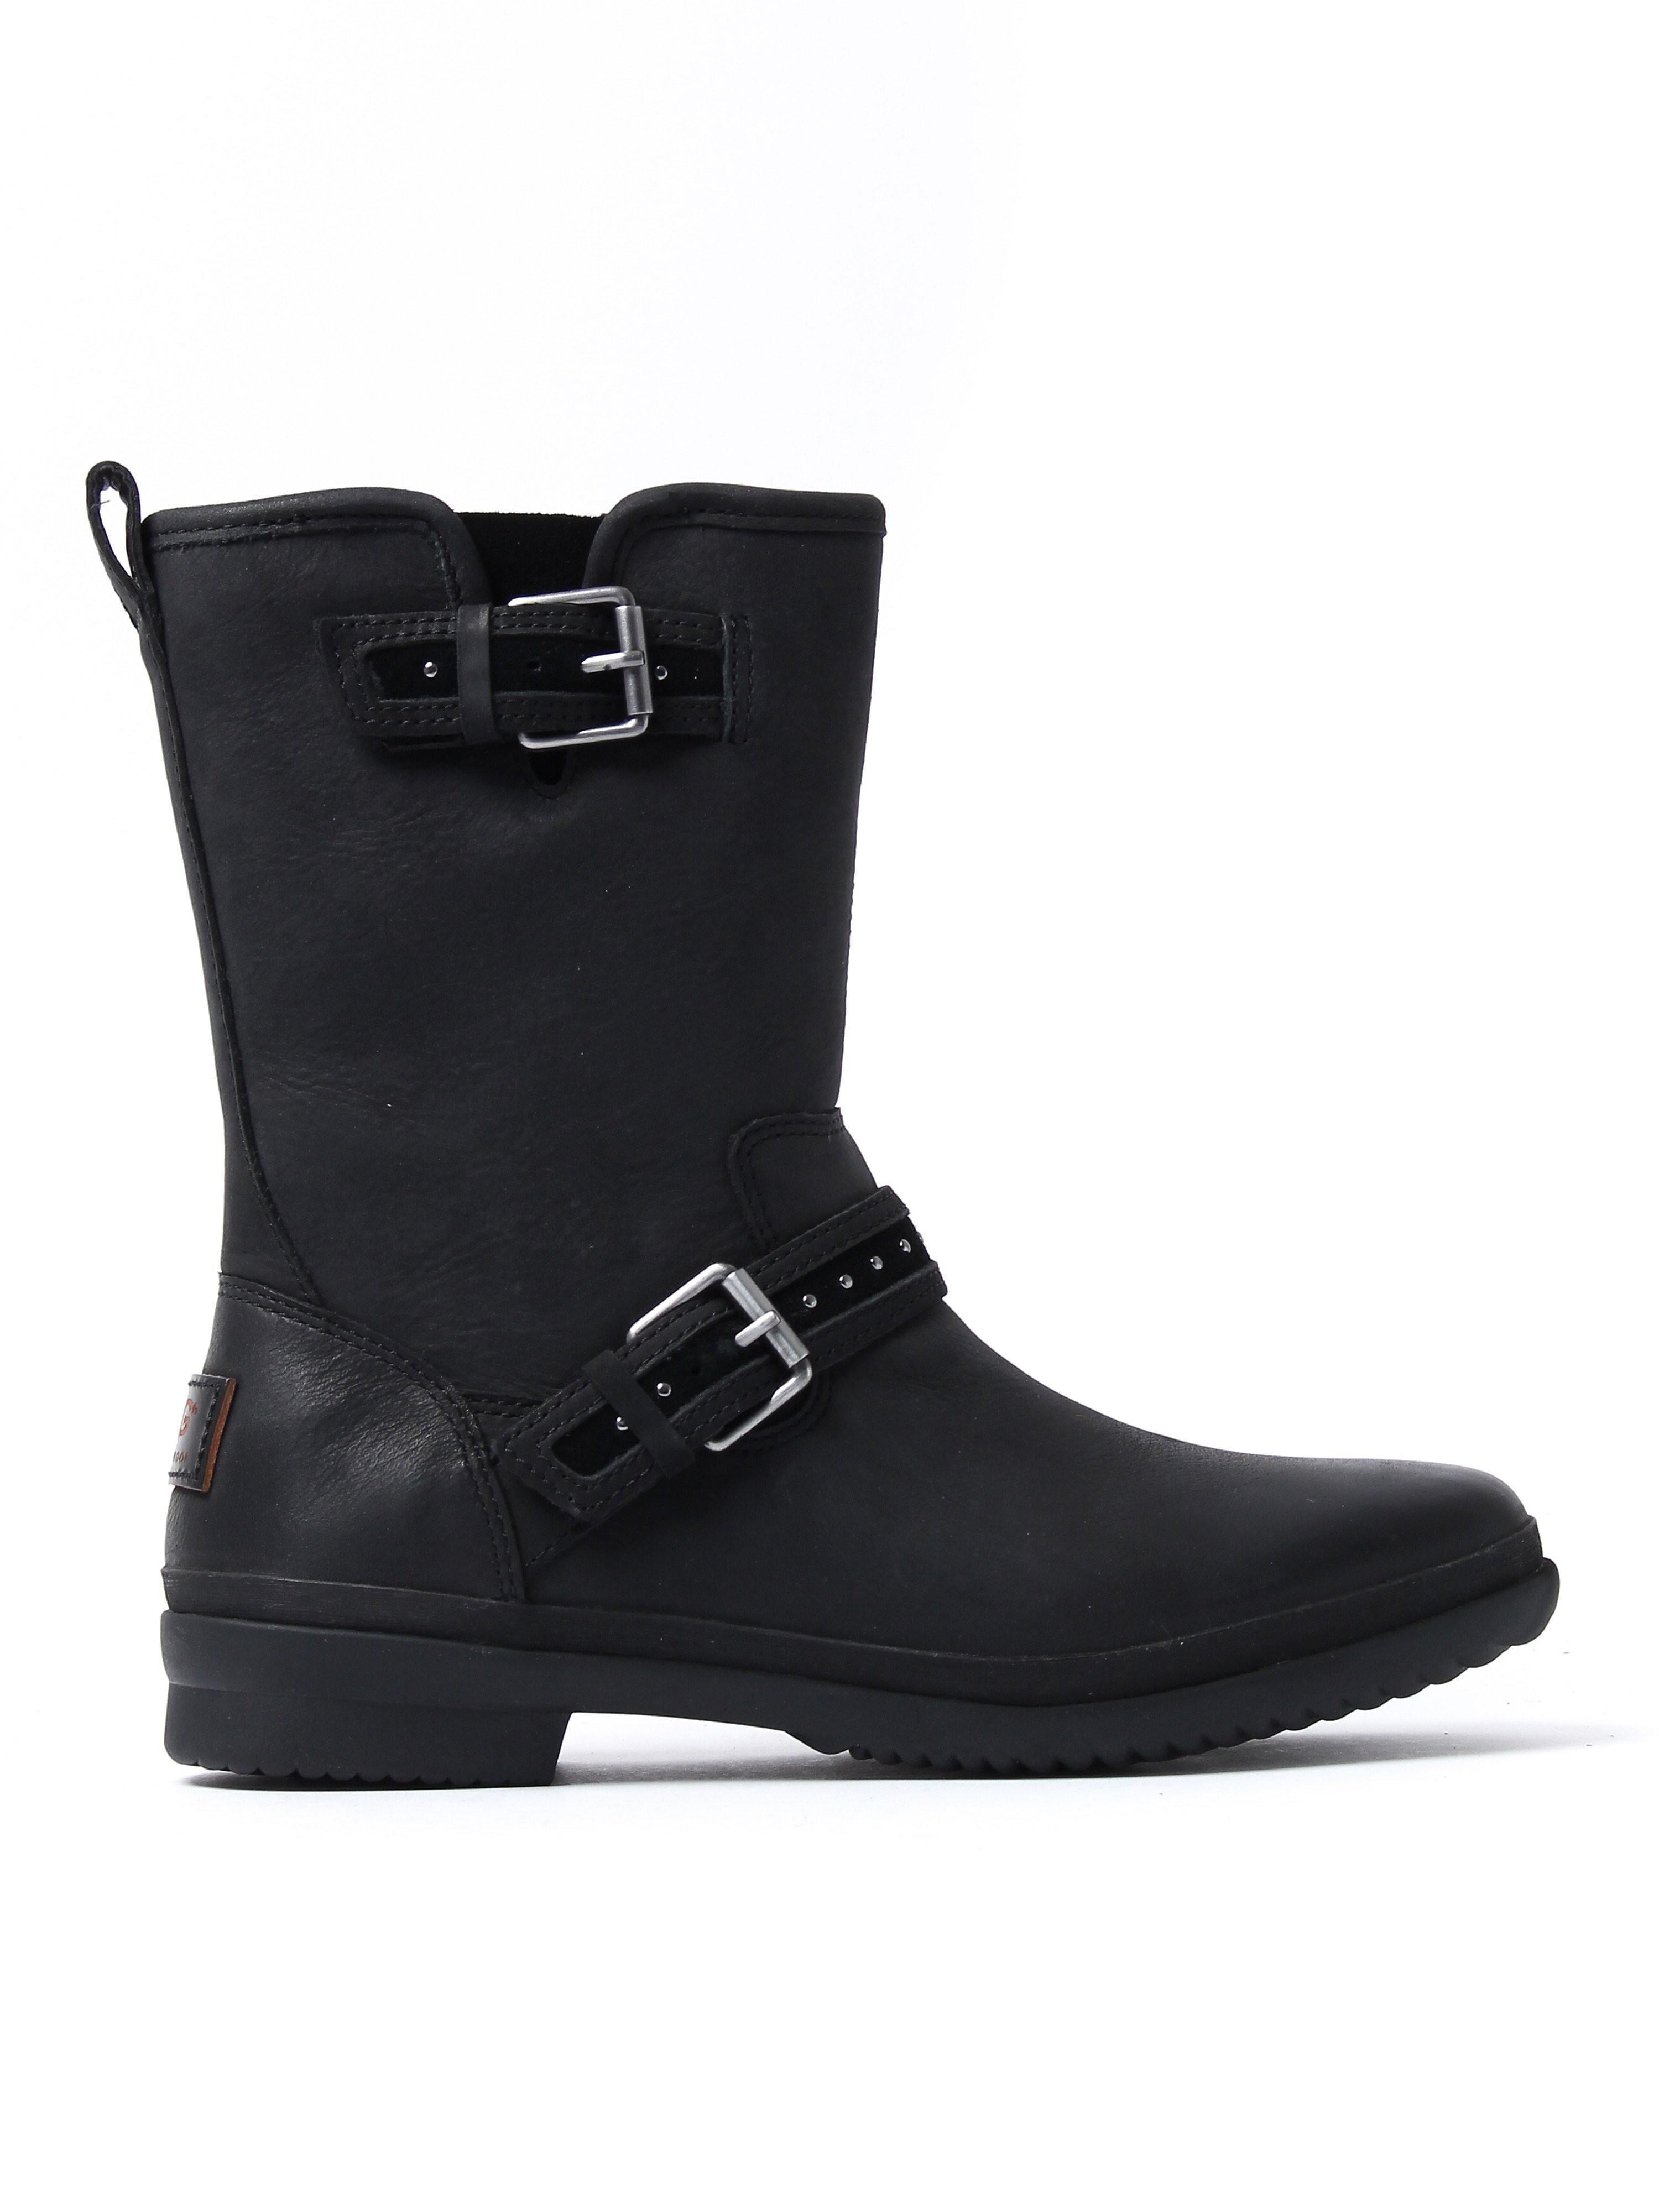 UGG Women's Jenise Biker Boots - Black Leather